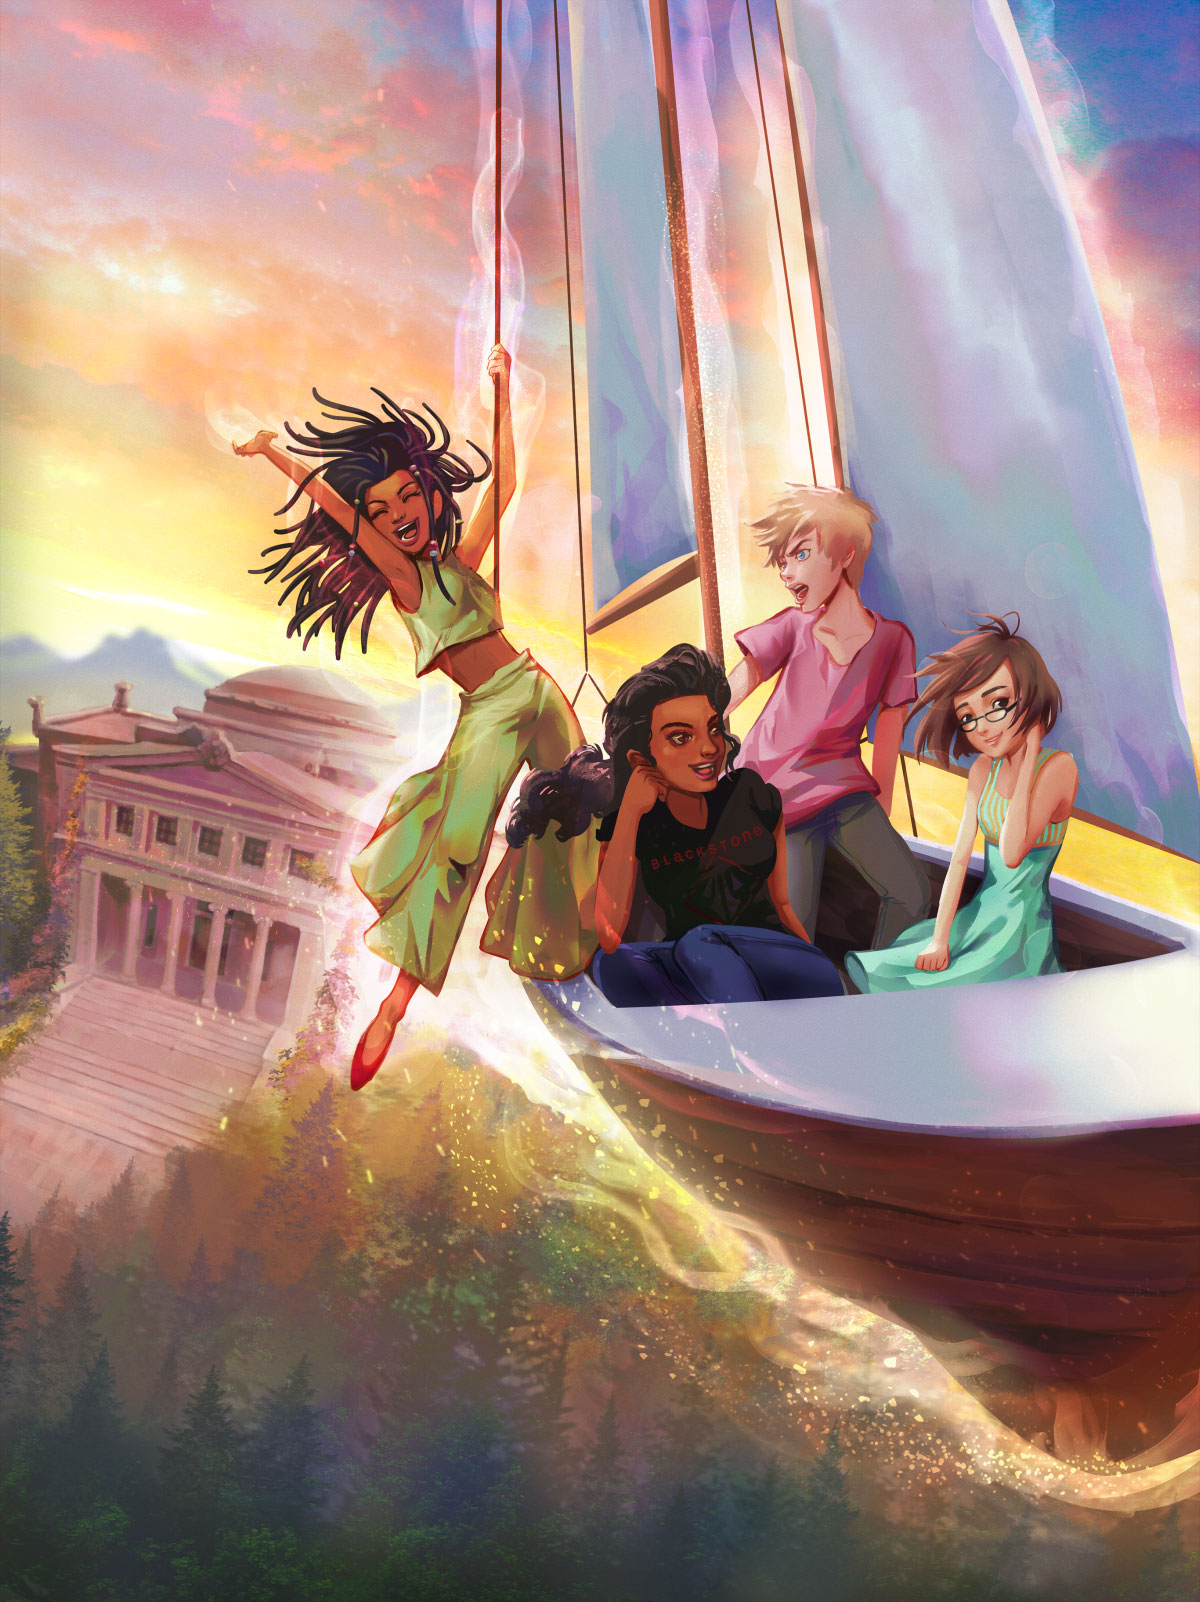 Paola-Tuazon - Blackstone Academy - Choice of Games Cover Art